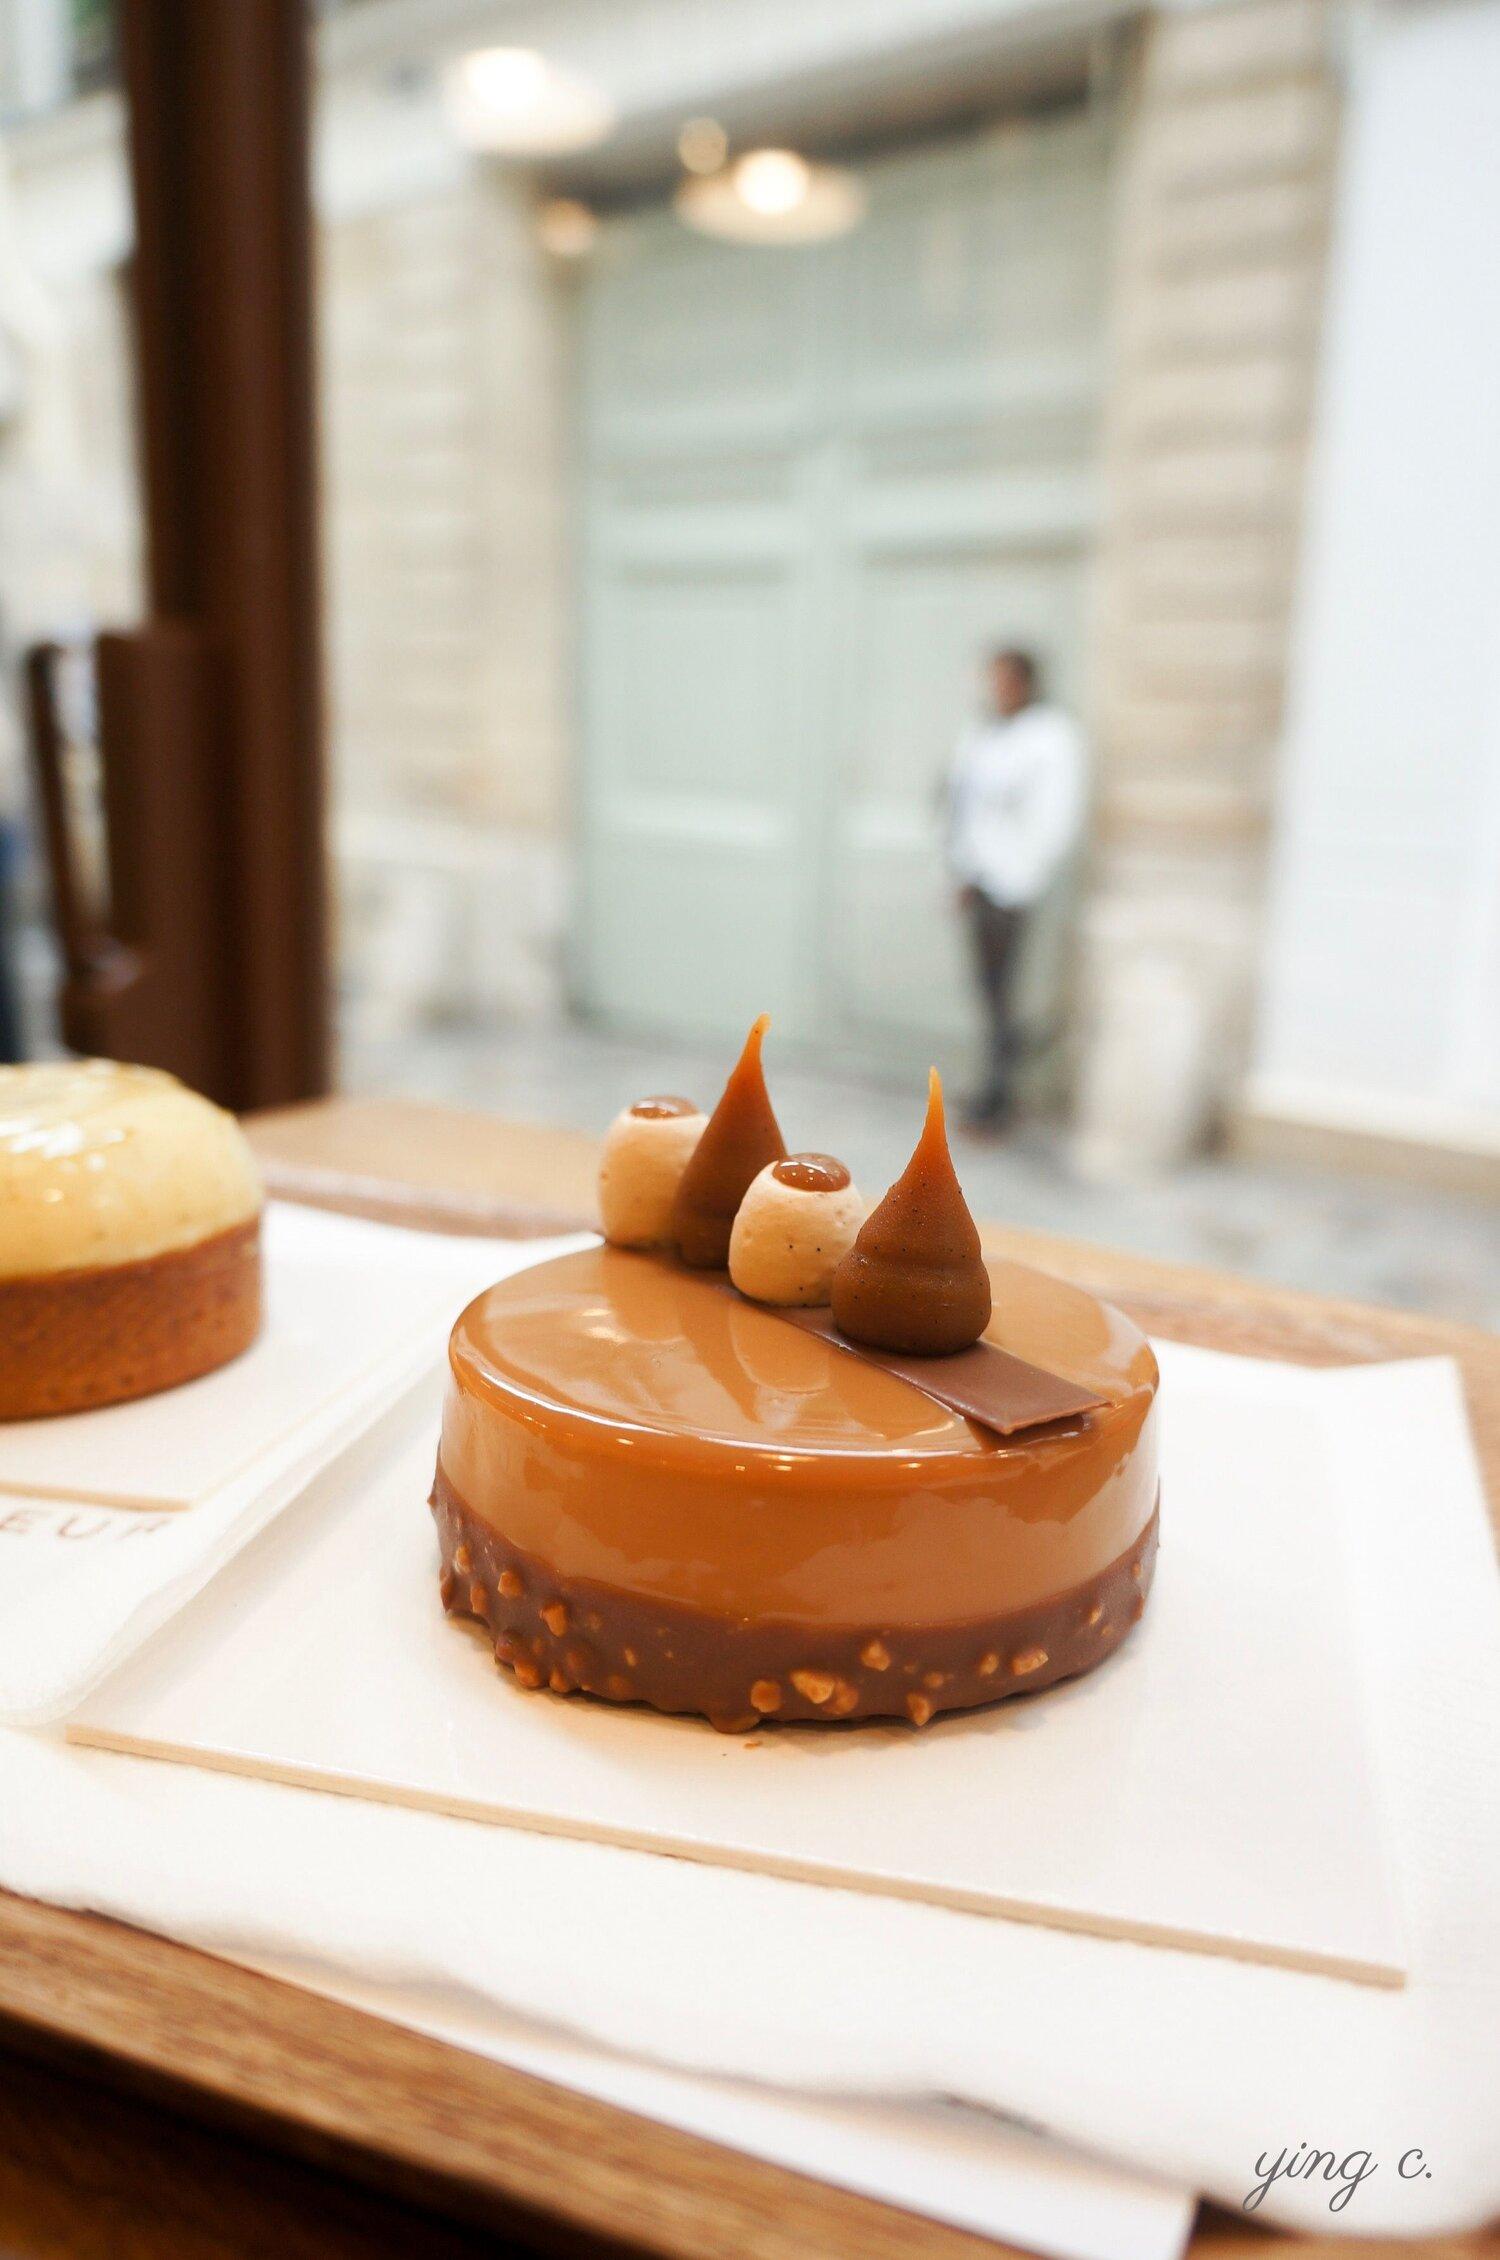 Johan Martin  主廚創作的「100% Caramel」法式蛋糕,外觀和歌劇院蛋糕有顯著差距。